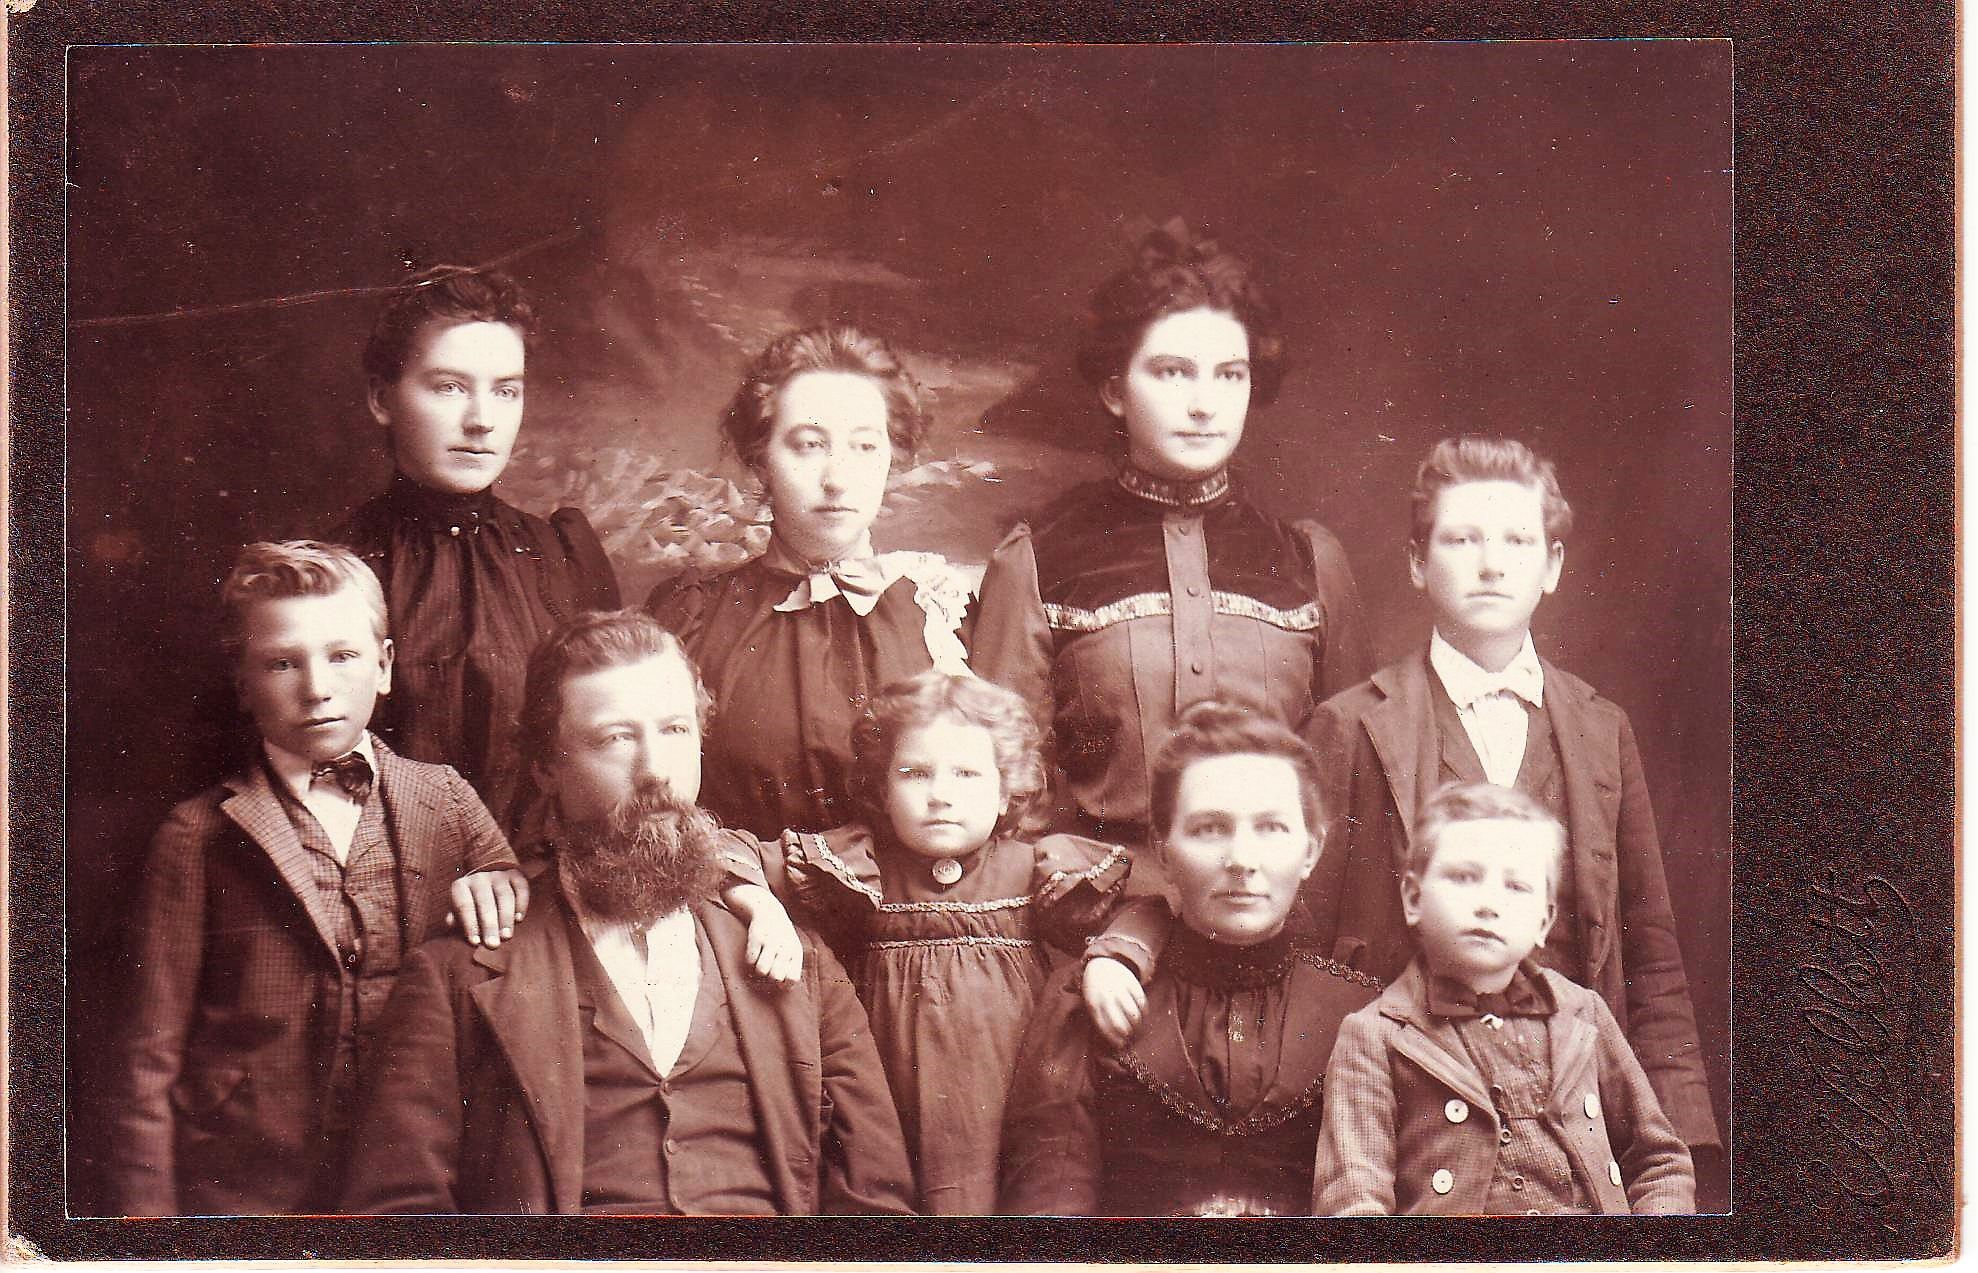 James L and Esther (Gleason) Brisendine Family